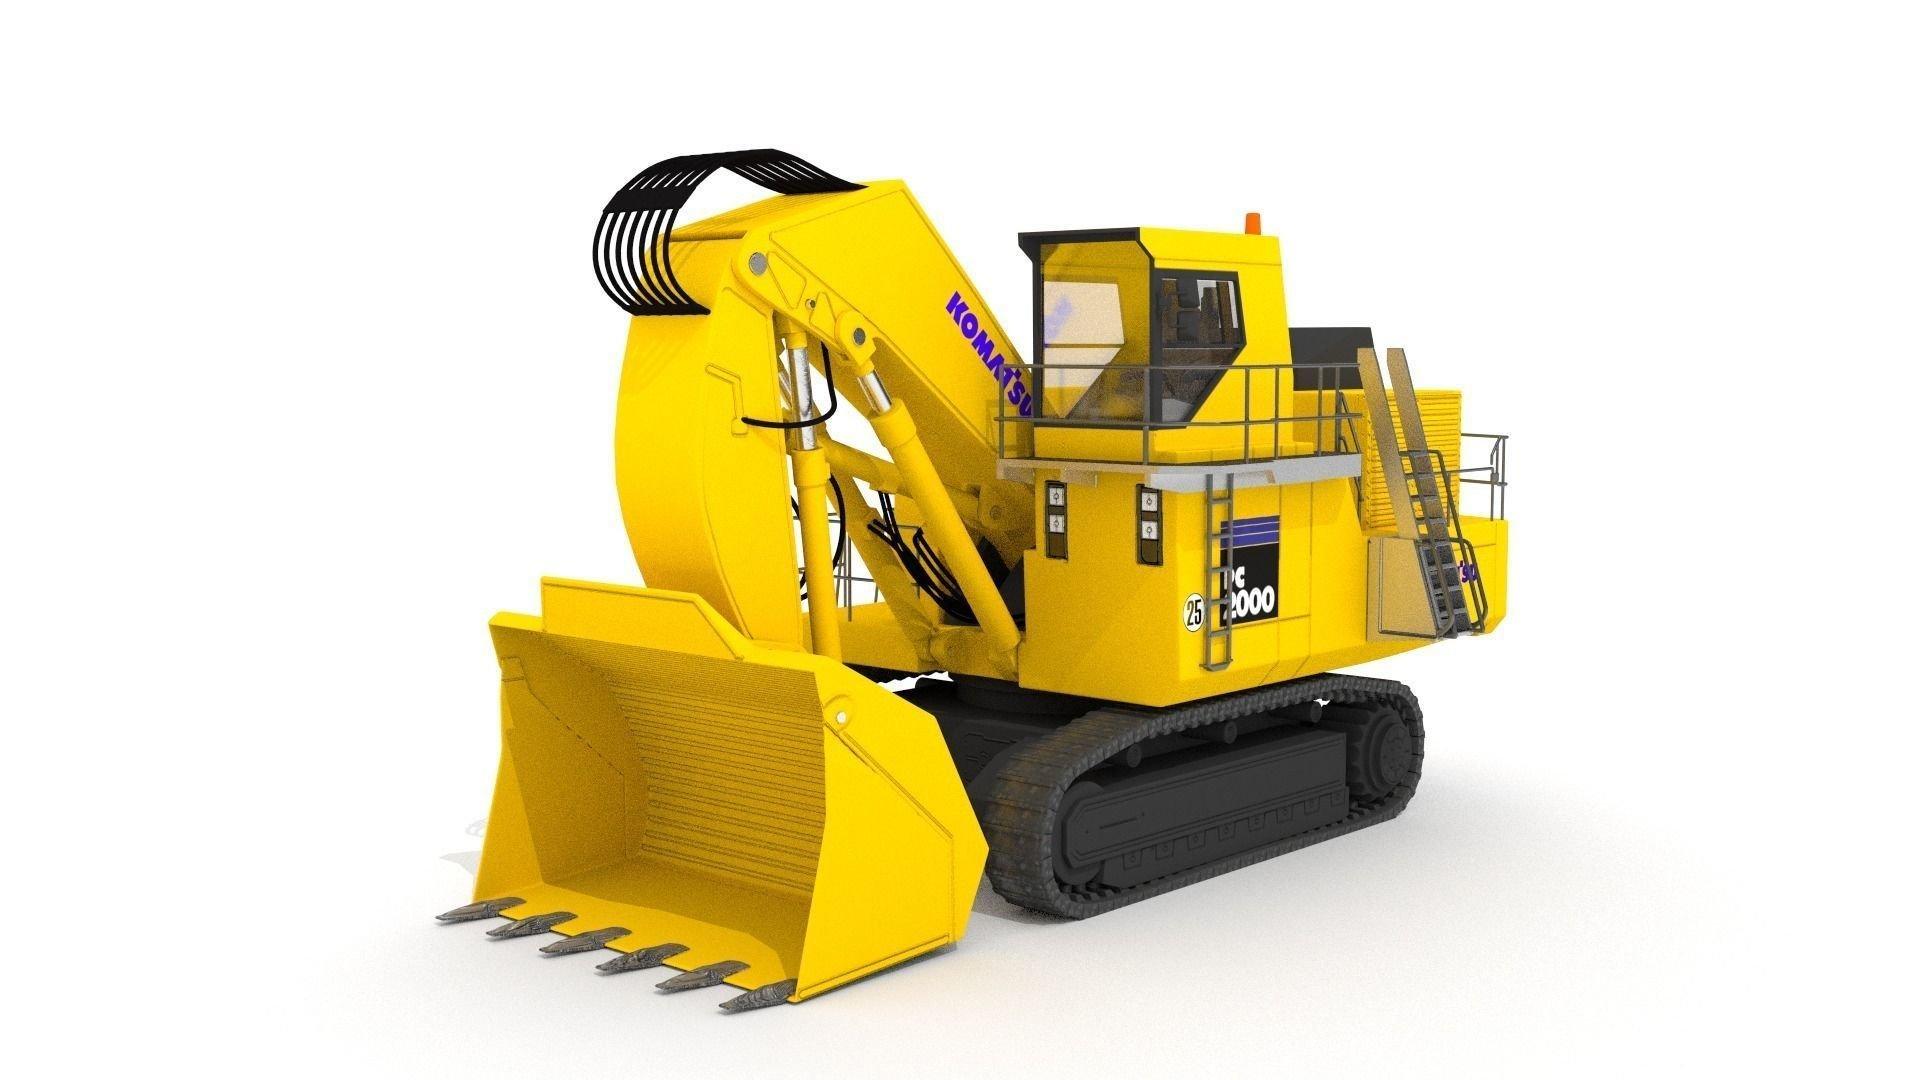 Komatsu PC2000-8 Excavator